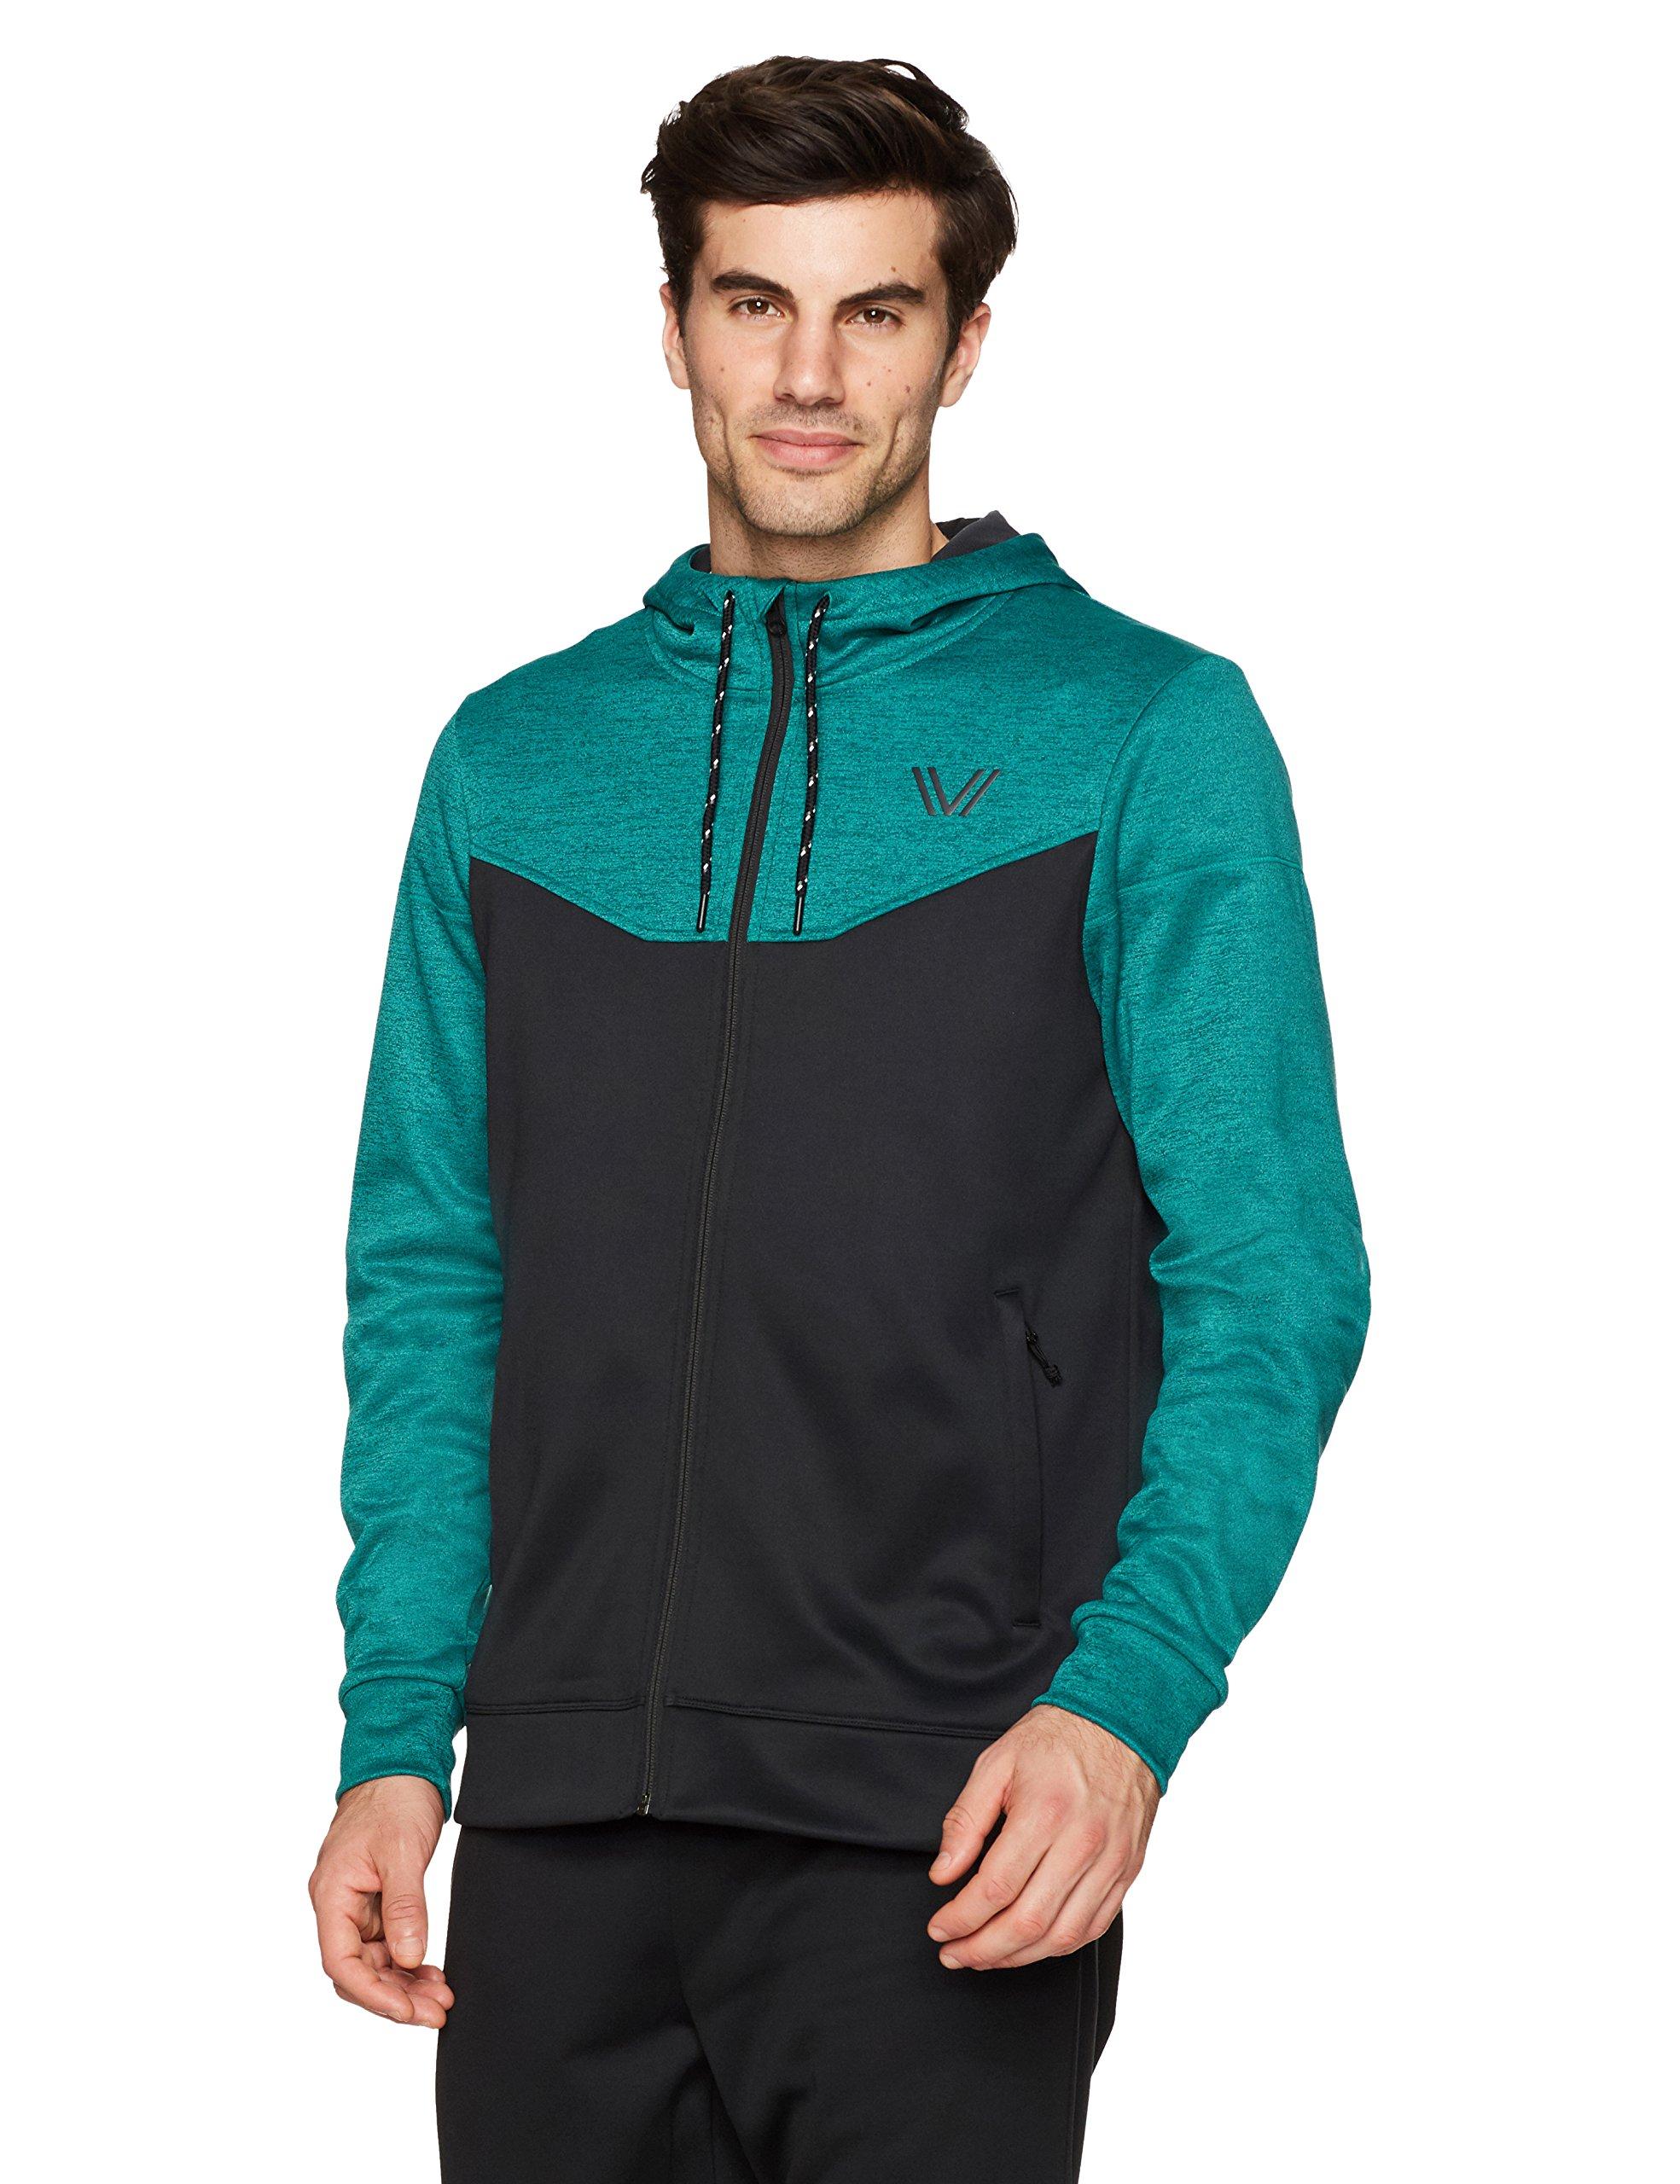 Peak Velocity Men's Quantum Fleece Full-Zip Loose-Fit Hoodie, Punch Green Heather/Black, X-Large